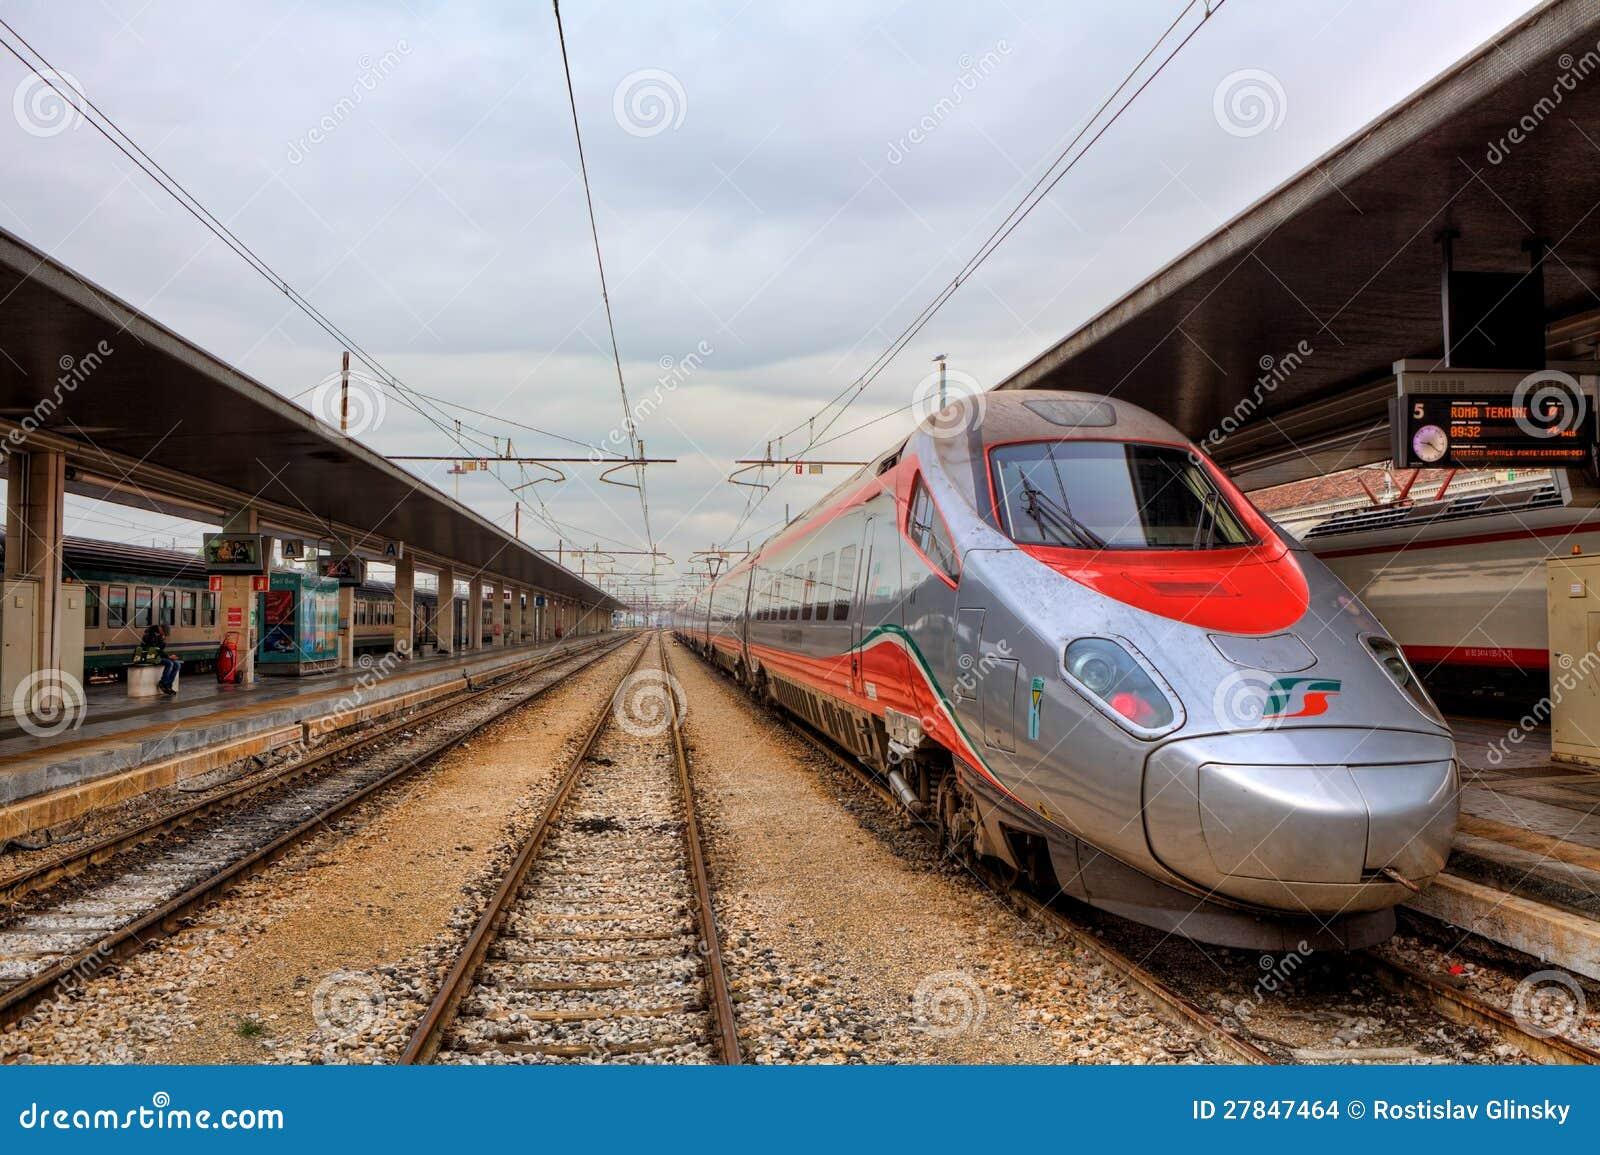 j k railway stations in venice - photo#30